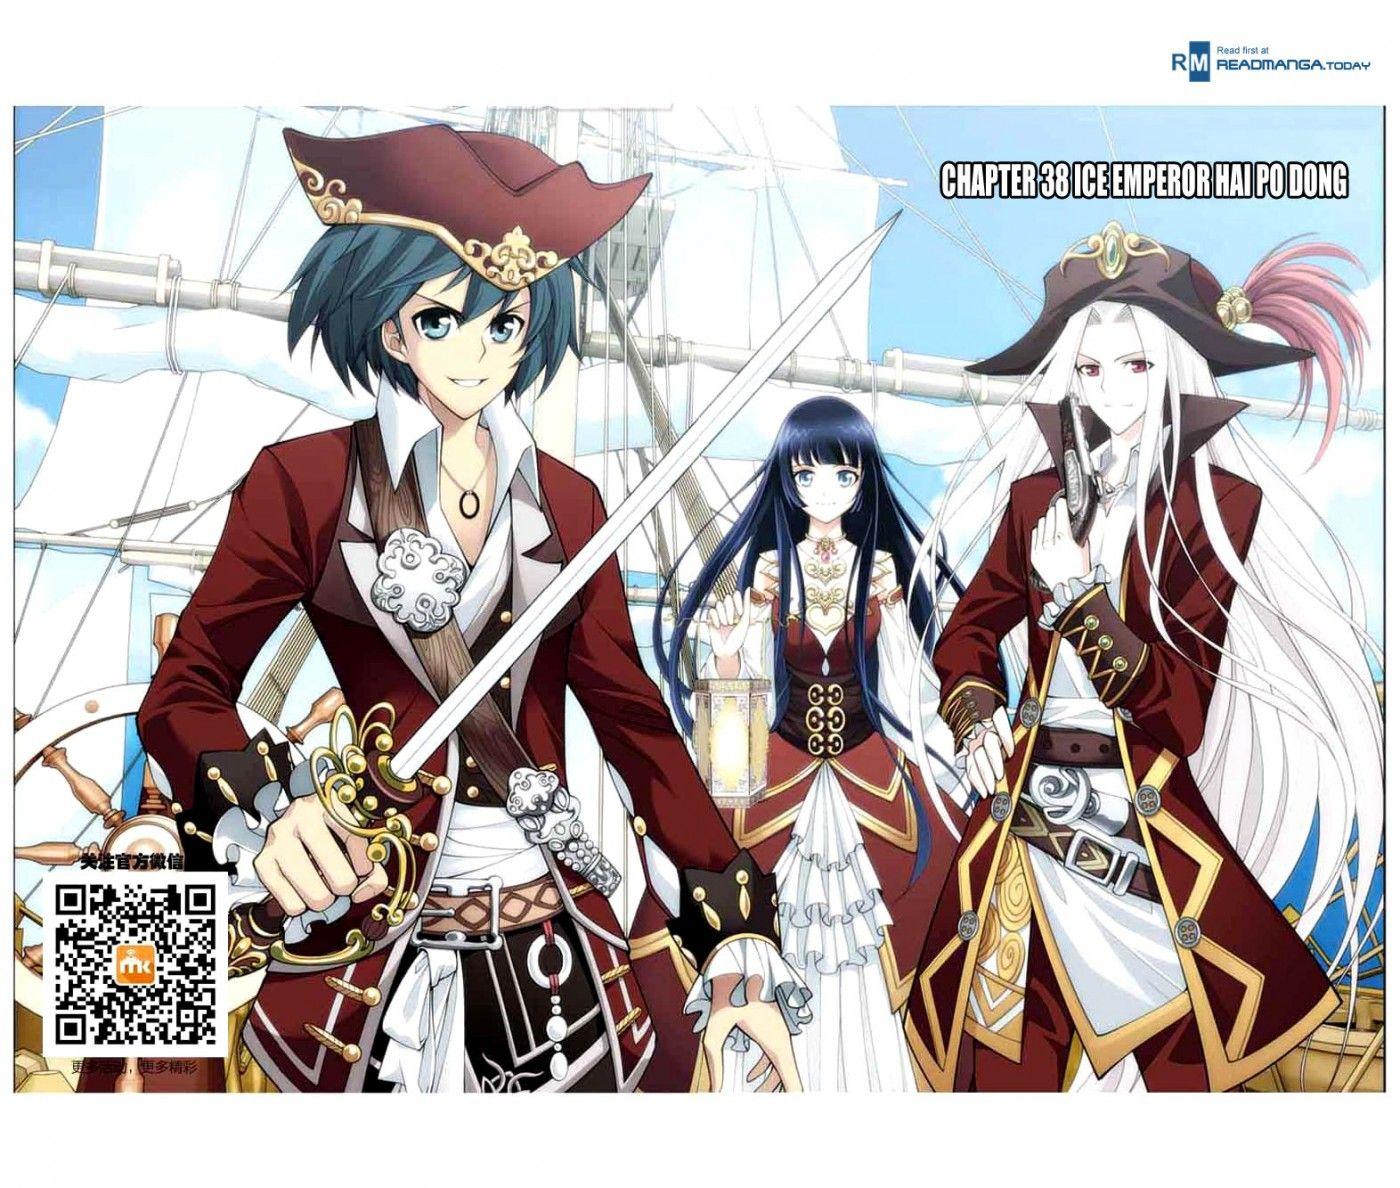 Doupo Cangqiong Manhua Lector Tumangaonline Anime Manga Battle